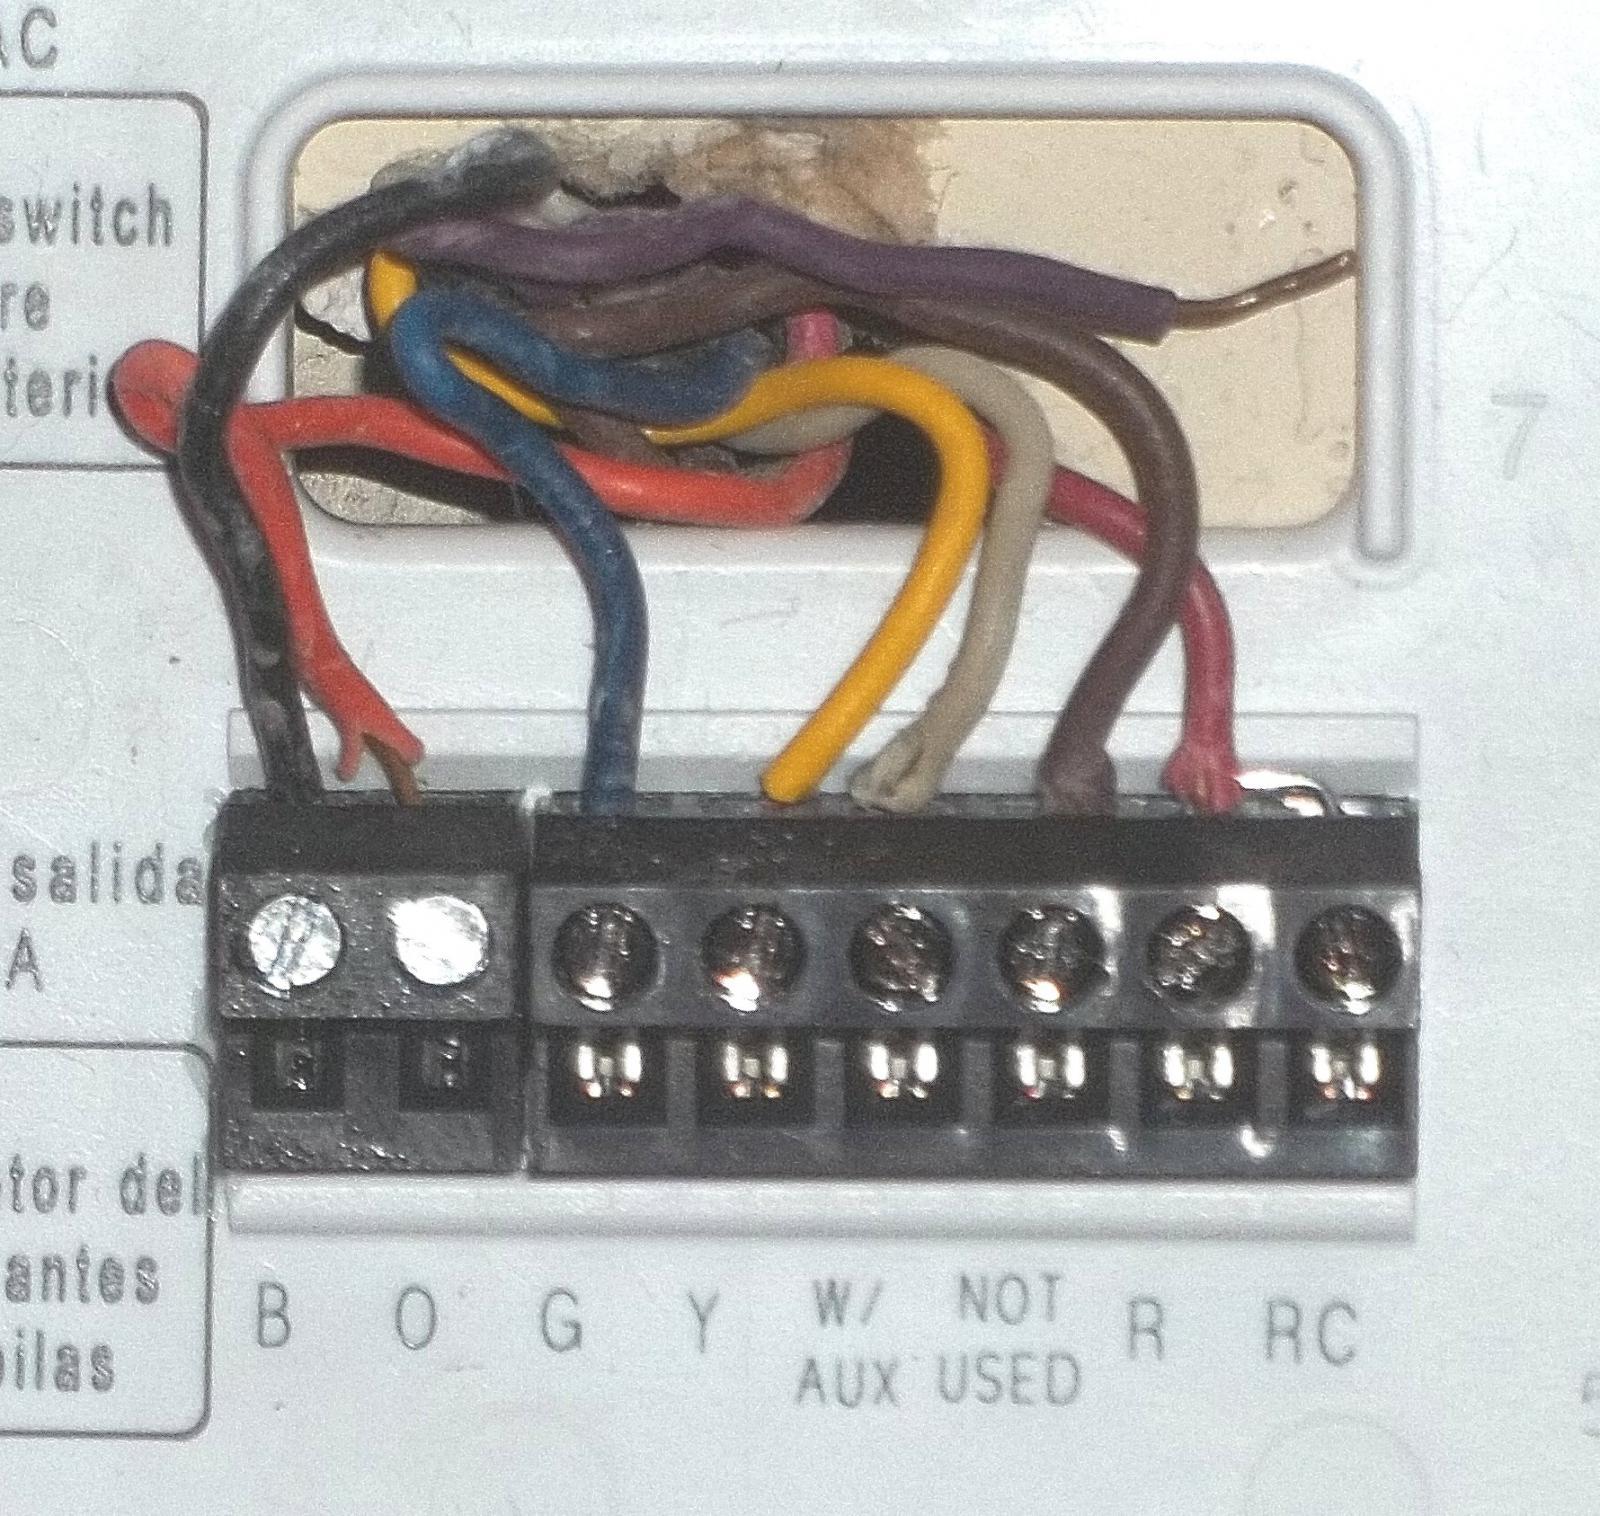 jameson thermostat wiring diagram jameson discover your wiring thermostat wiring help tech support forum